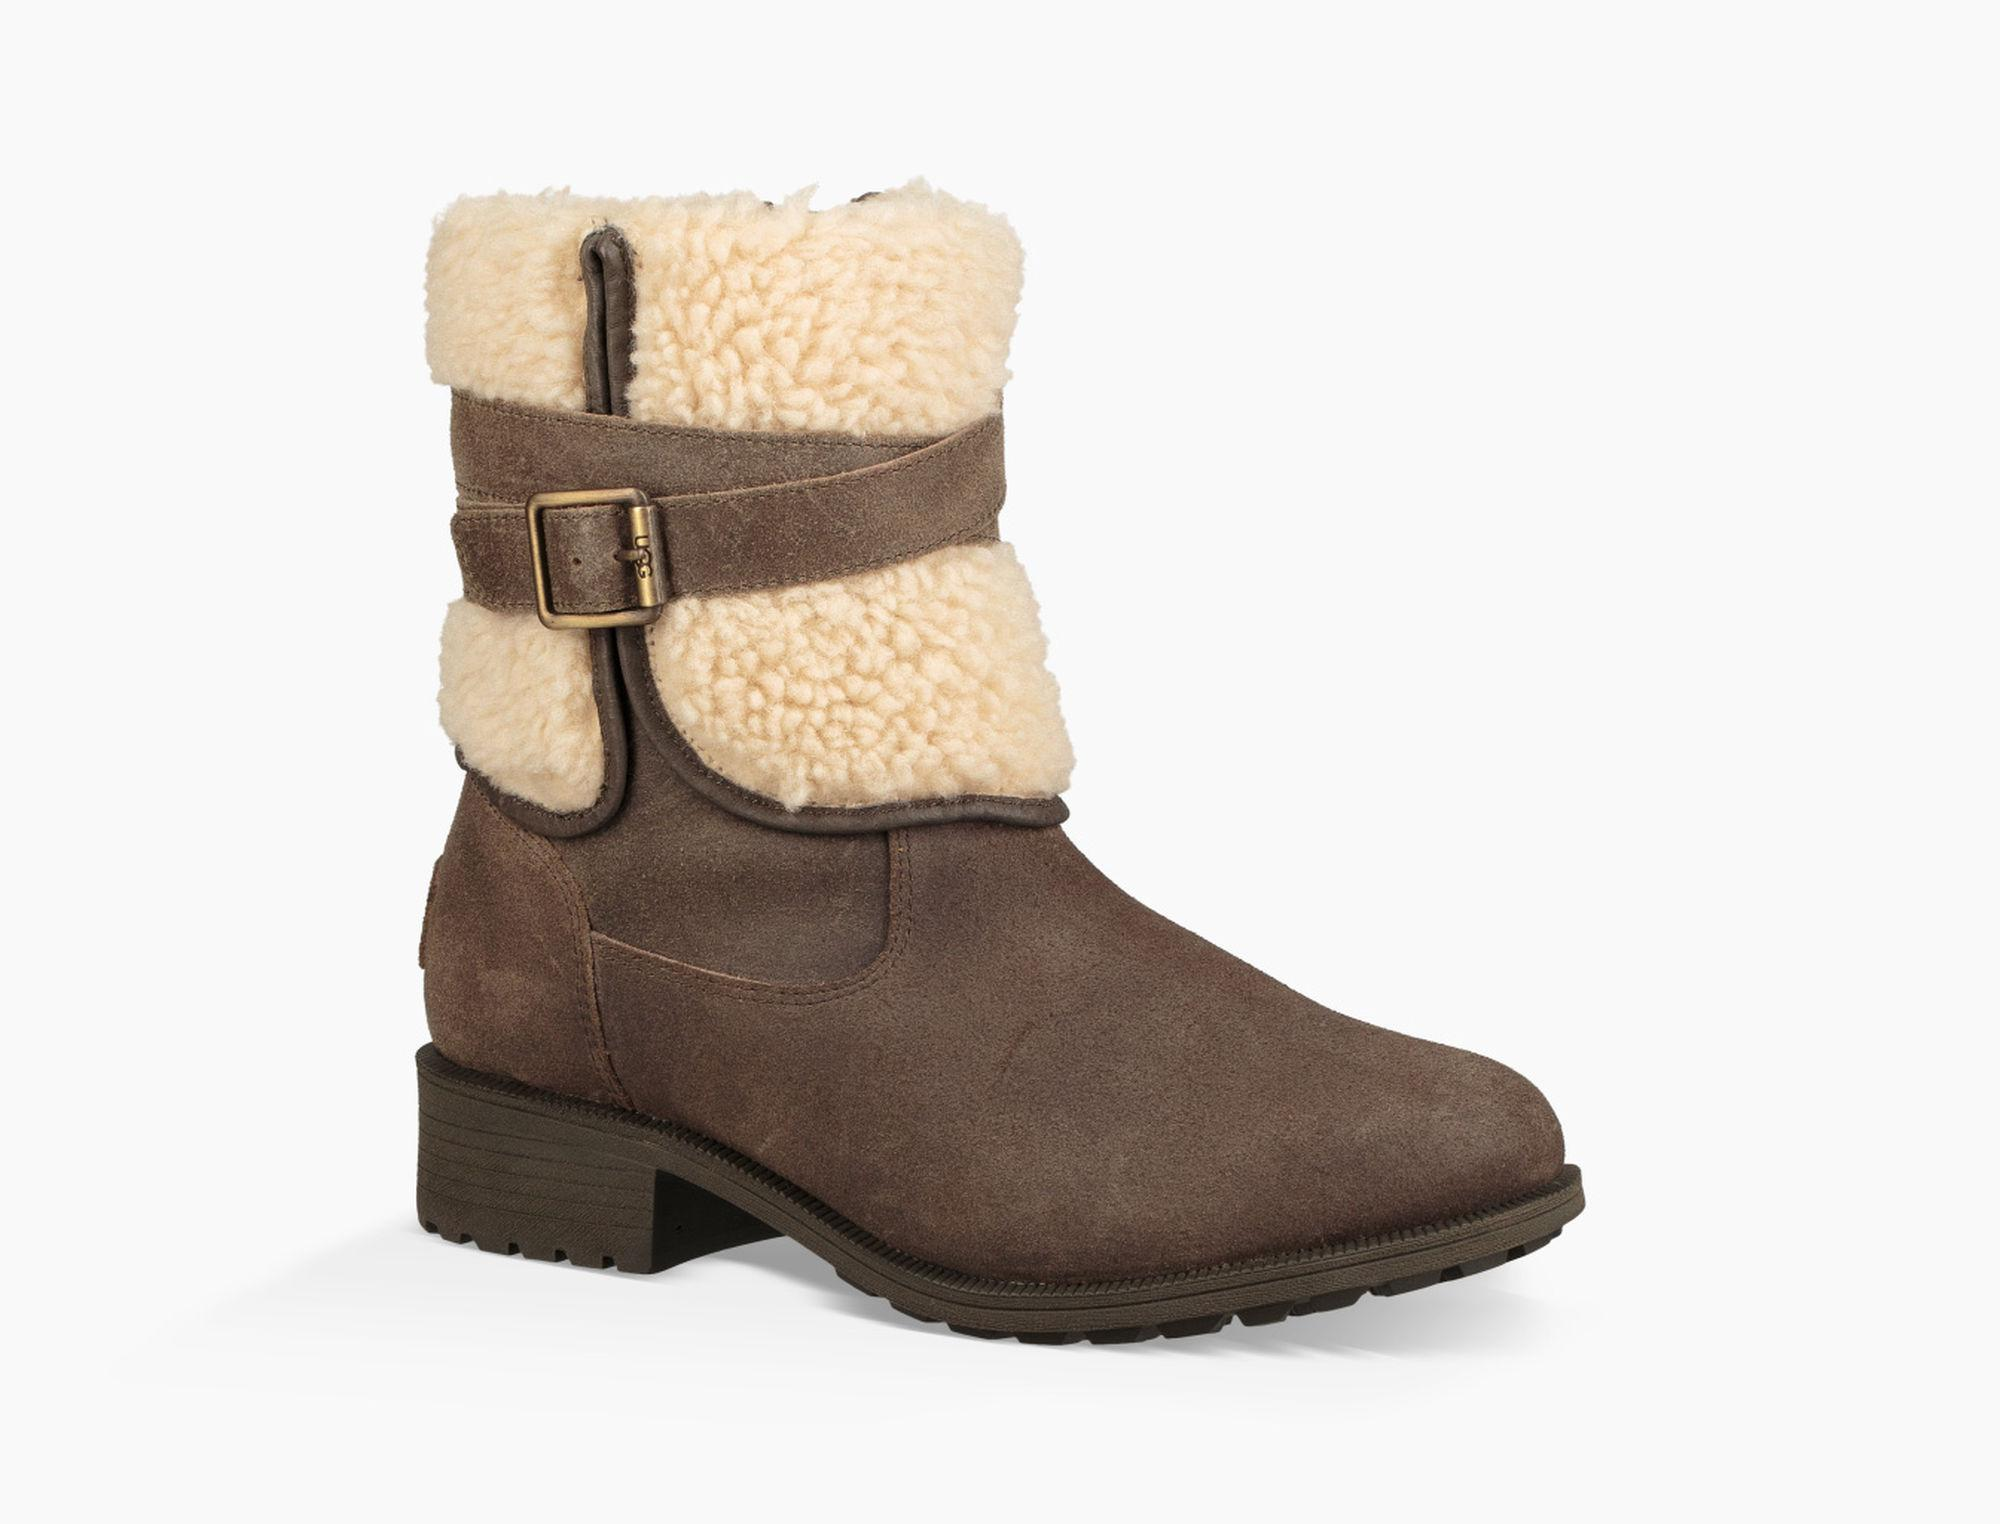 0357cb83c4d Lyst - UGG Blayre Iii Boot Blayre Iii Boot in Brown